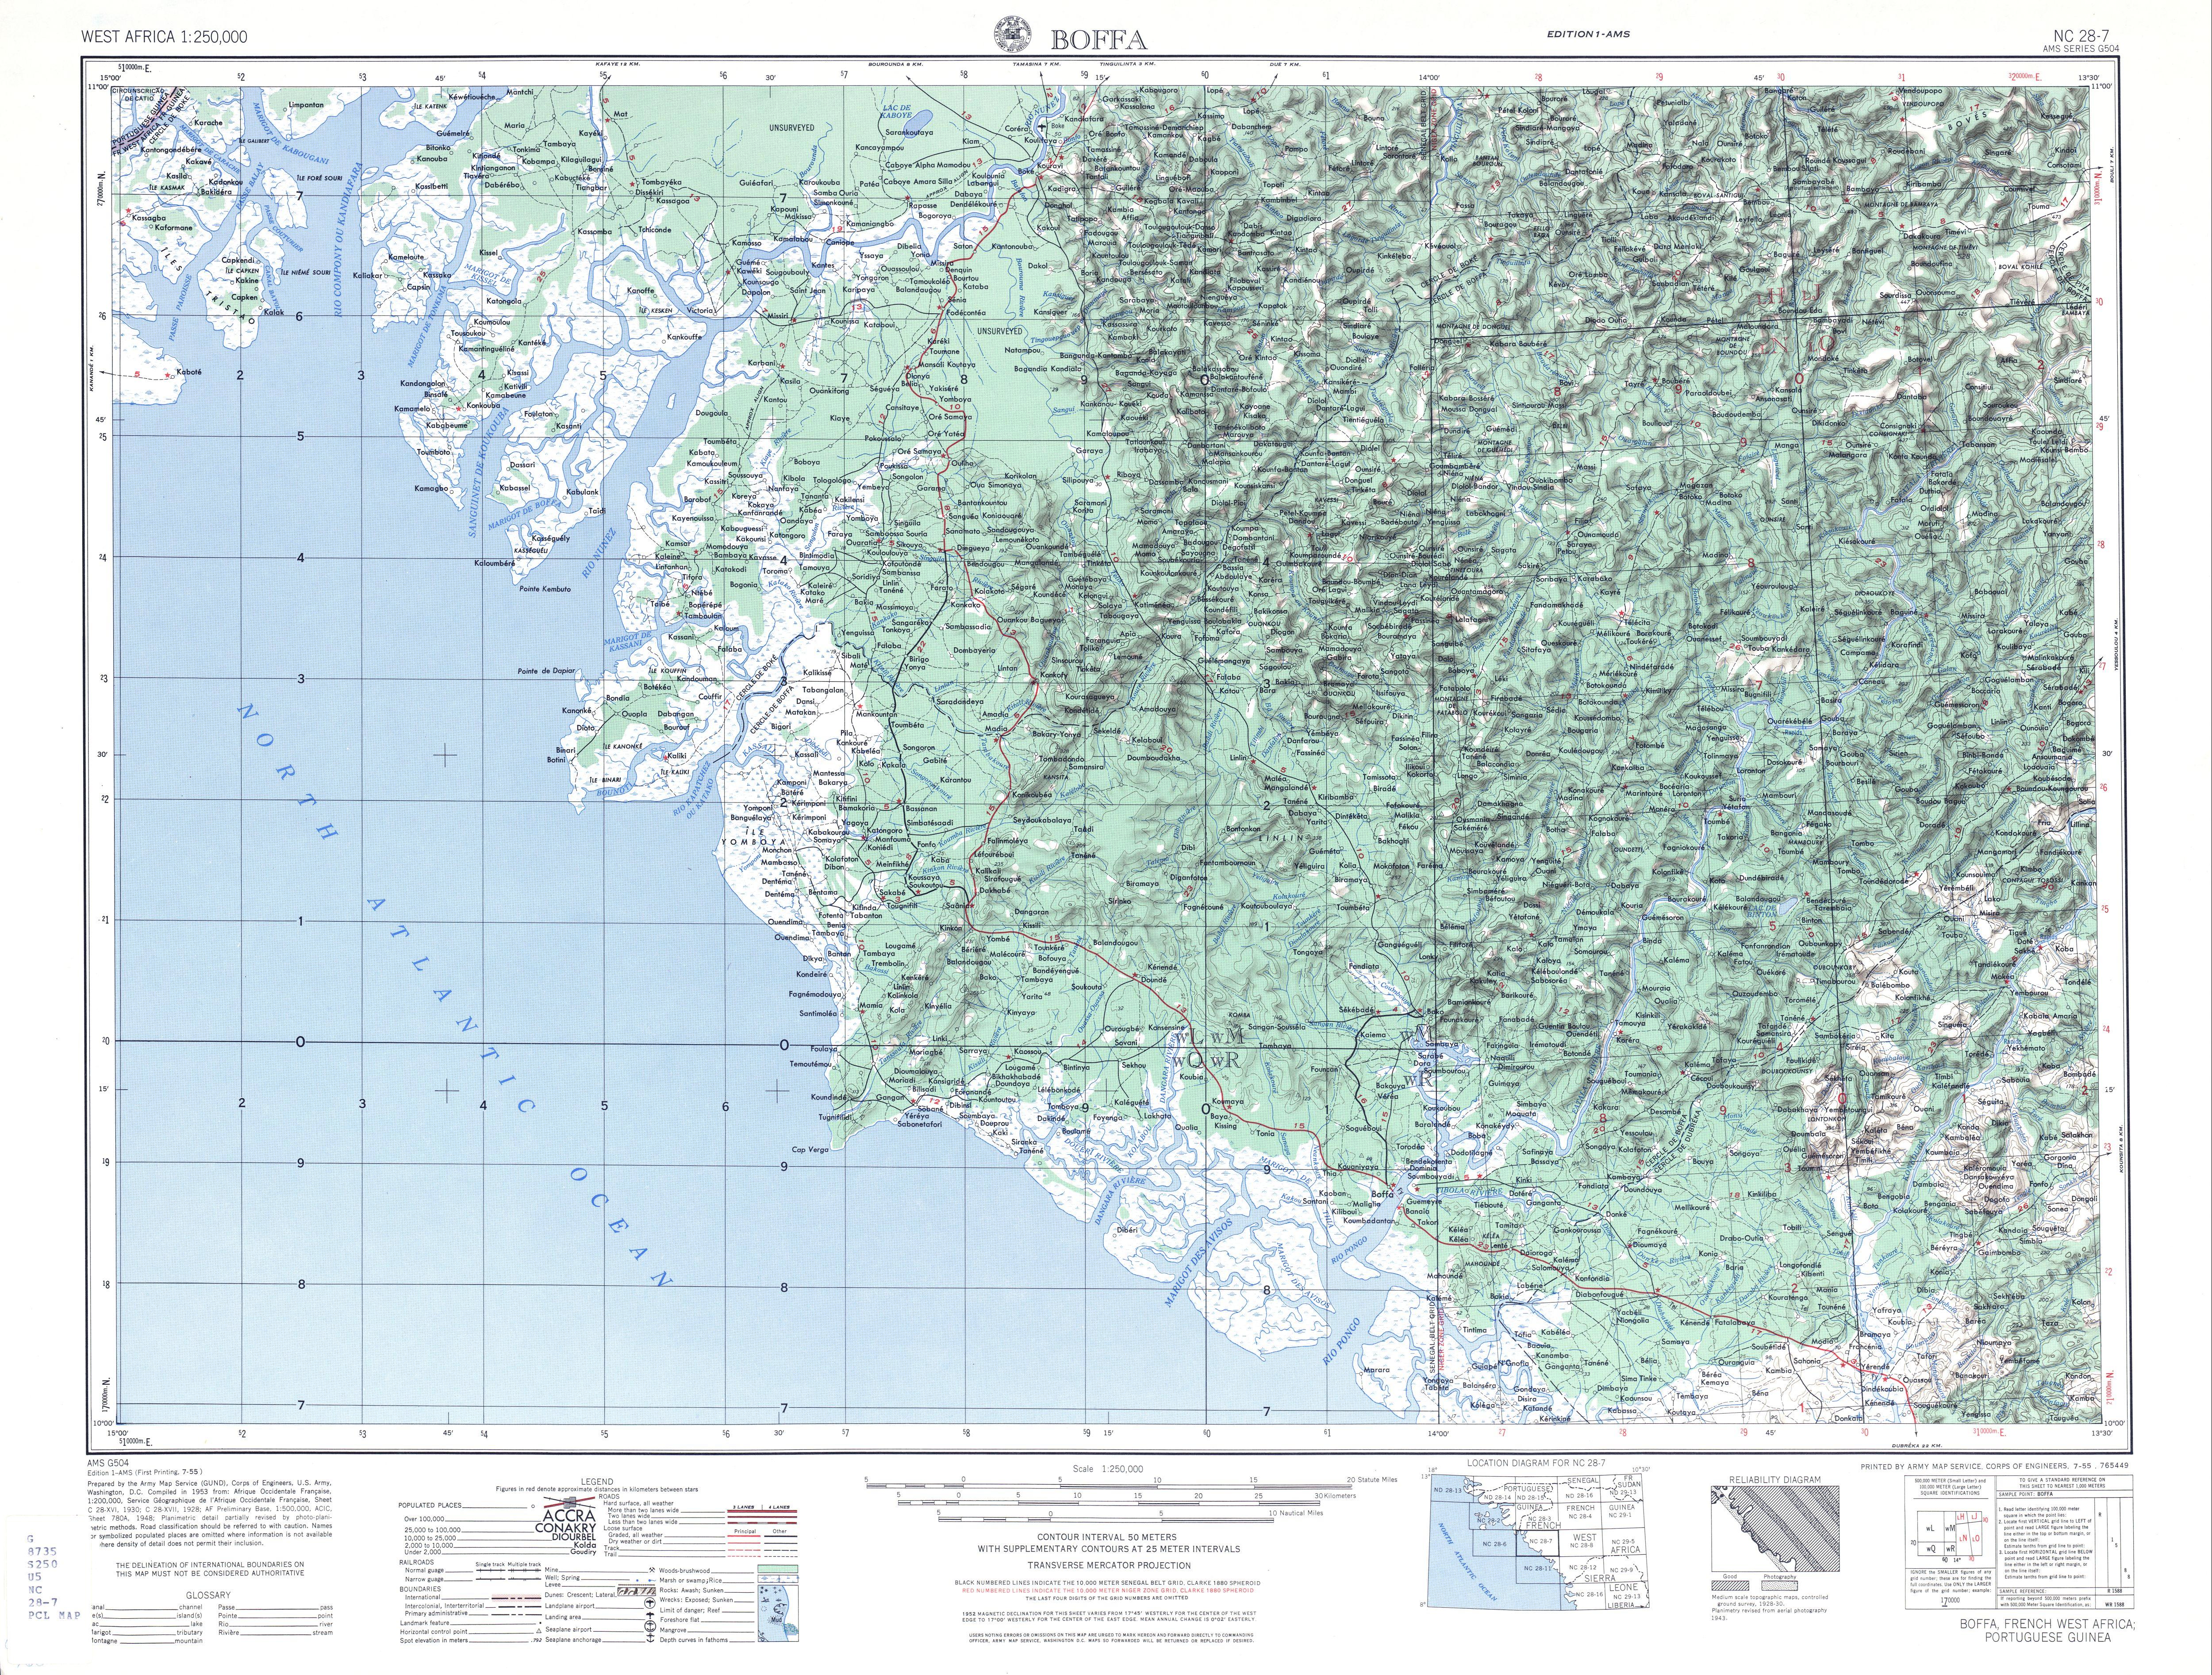 Hoja Boffa del Mapa Topográfico de África Occidental 1955